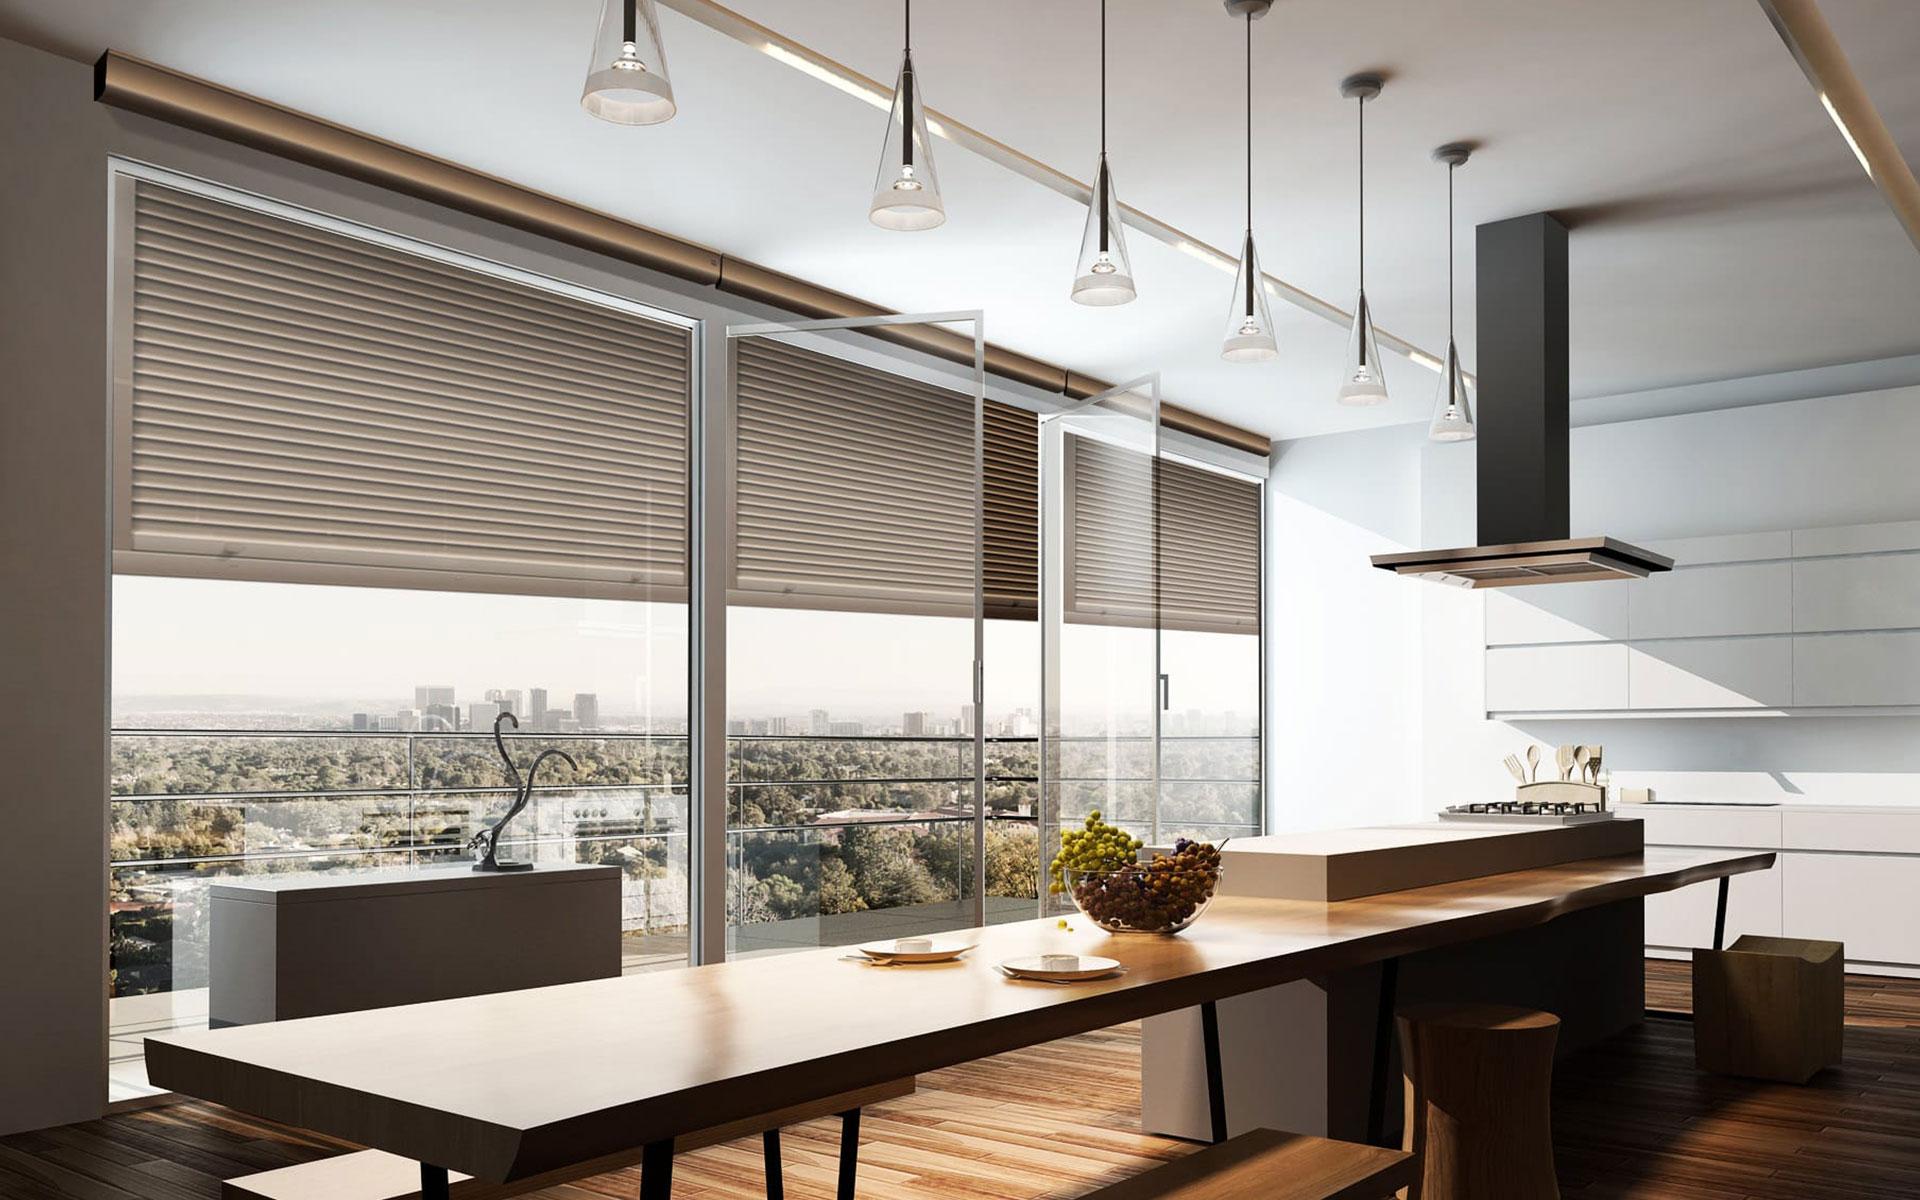 electricien antibes at elec entreprise lectricit et automatisme faac. Black Bedroom Furniture Sets. Home Design Ideas